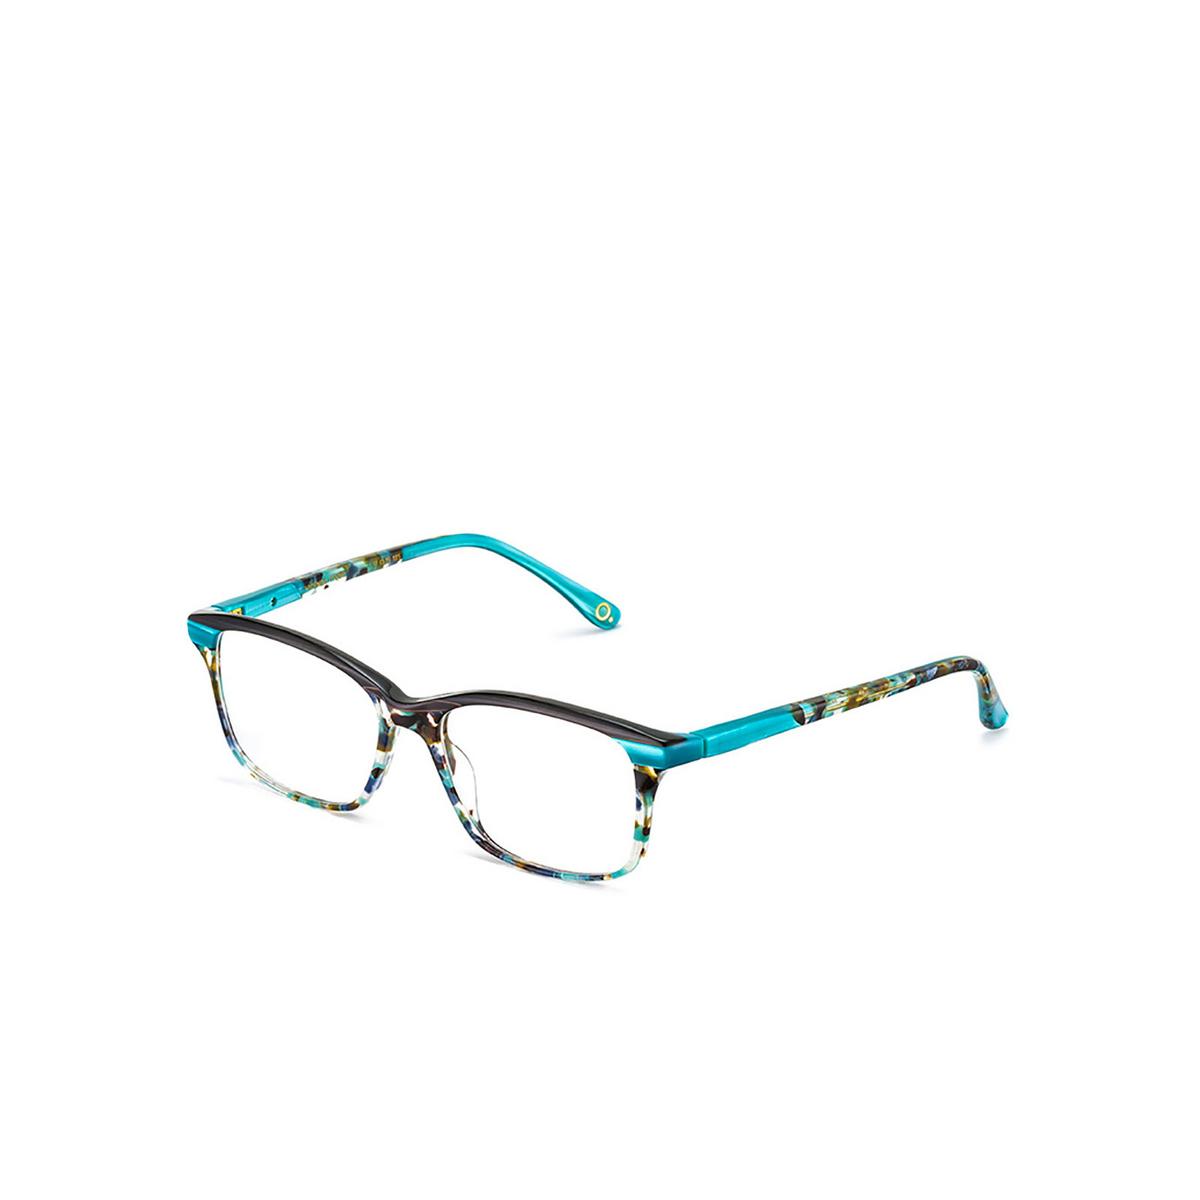 Etnia Barcelona® Square Eyeglasses: Vicenza color Tqbr - three-quarters view.